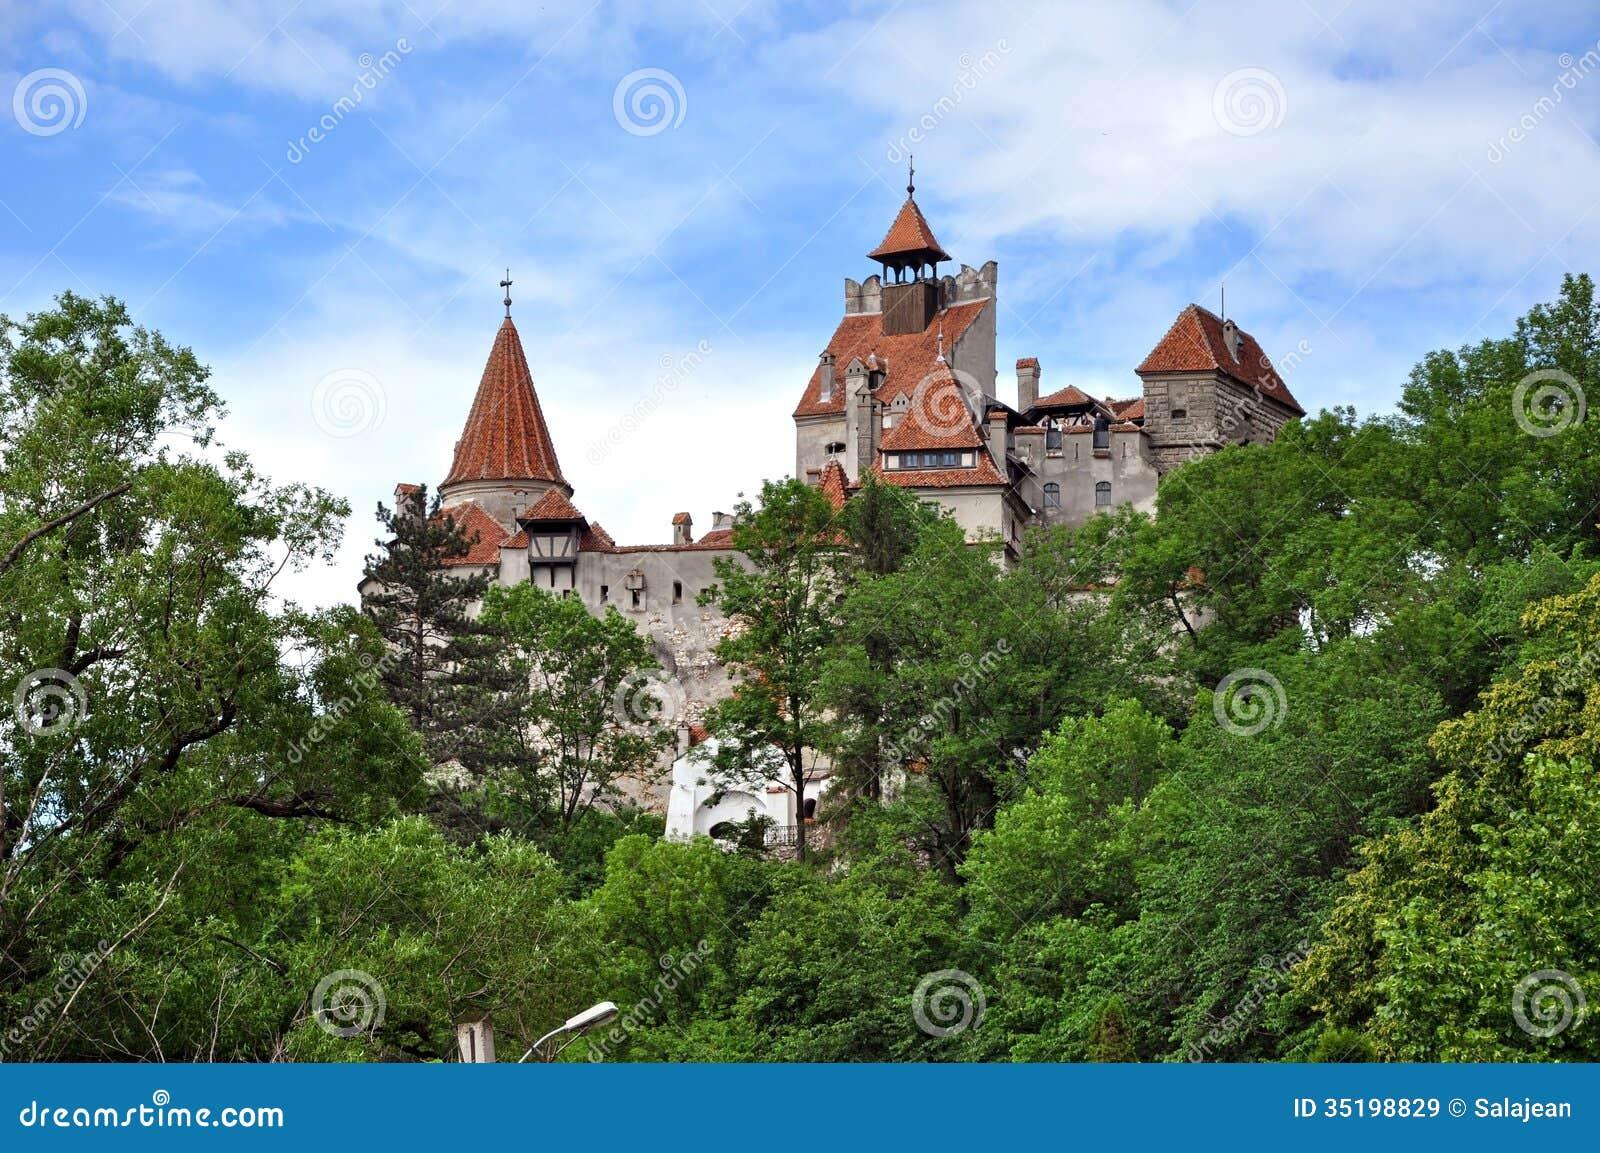 Het Kasteel Van Dracula  Zemelen, Transsylvani u00eb, Roemeni u00eb Royalty vrije Stock Afbeeldingen